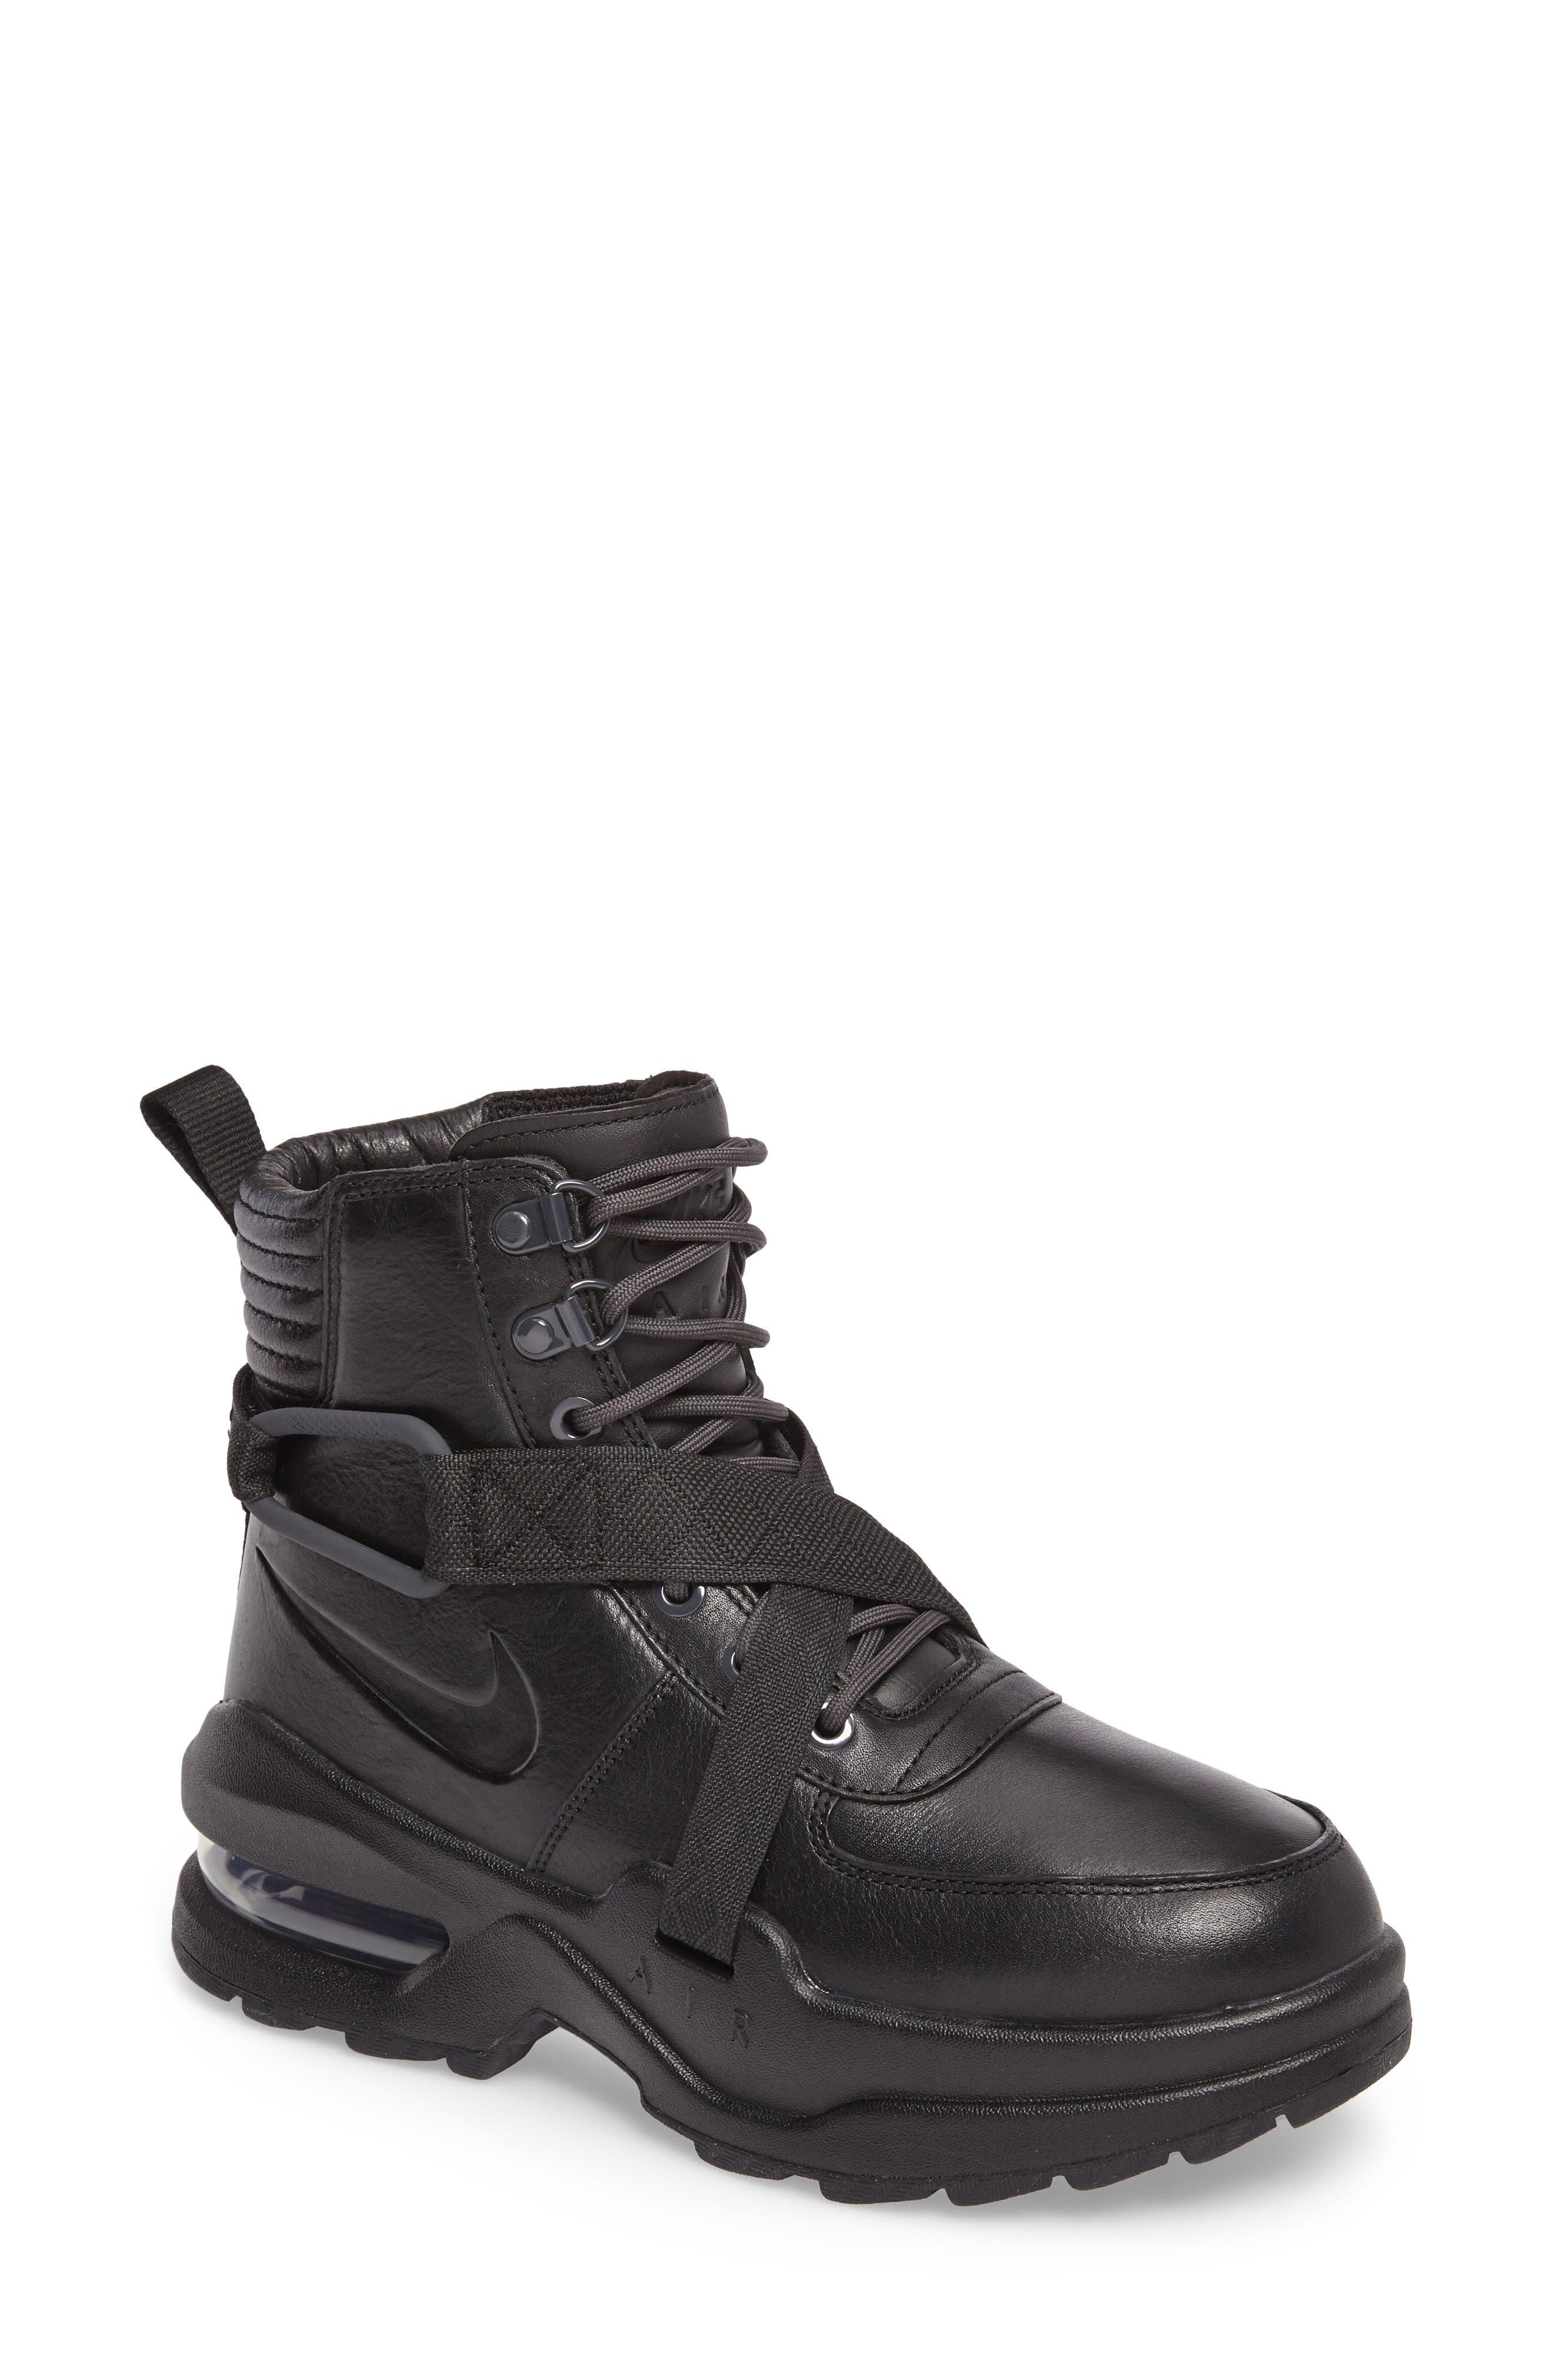 Air Max Goadome Sneaker Boot,                         Main,                         color, BLACK/ ANTHRACITE/ BLACK